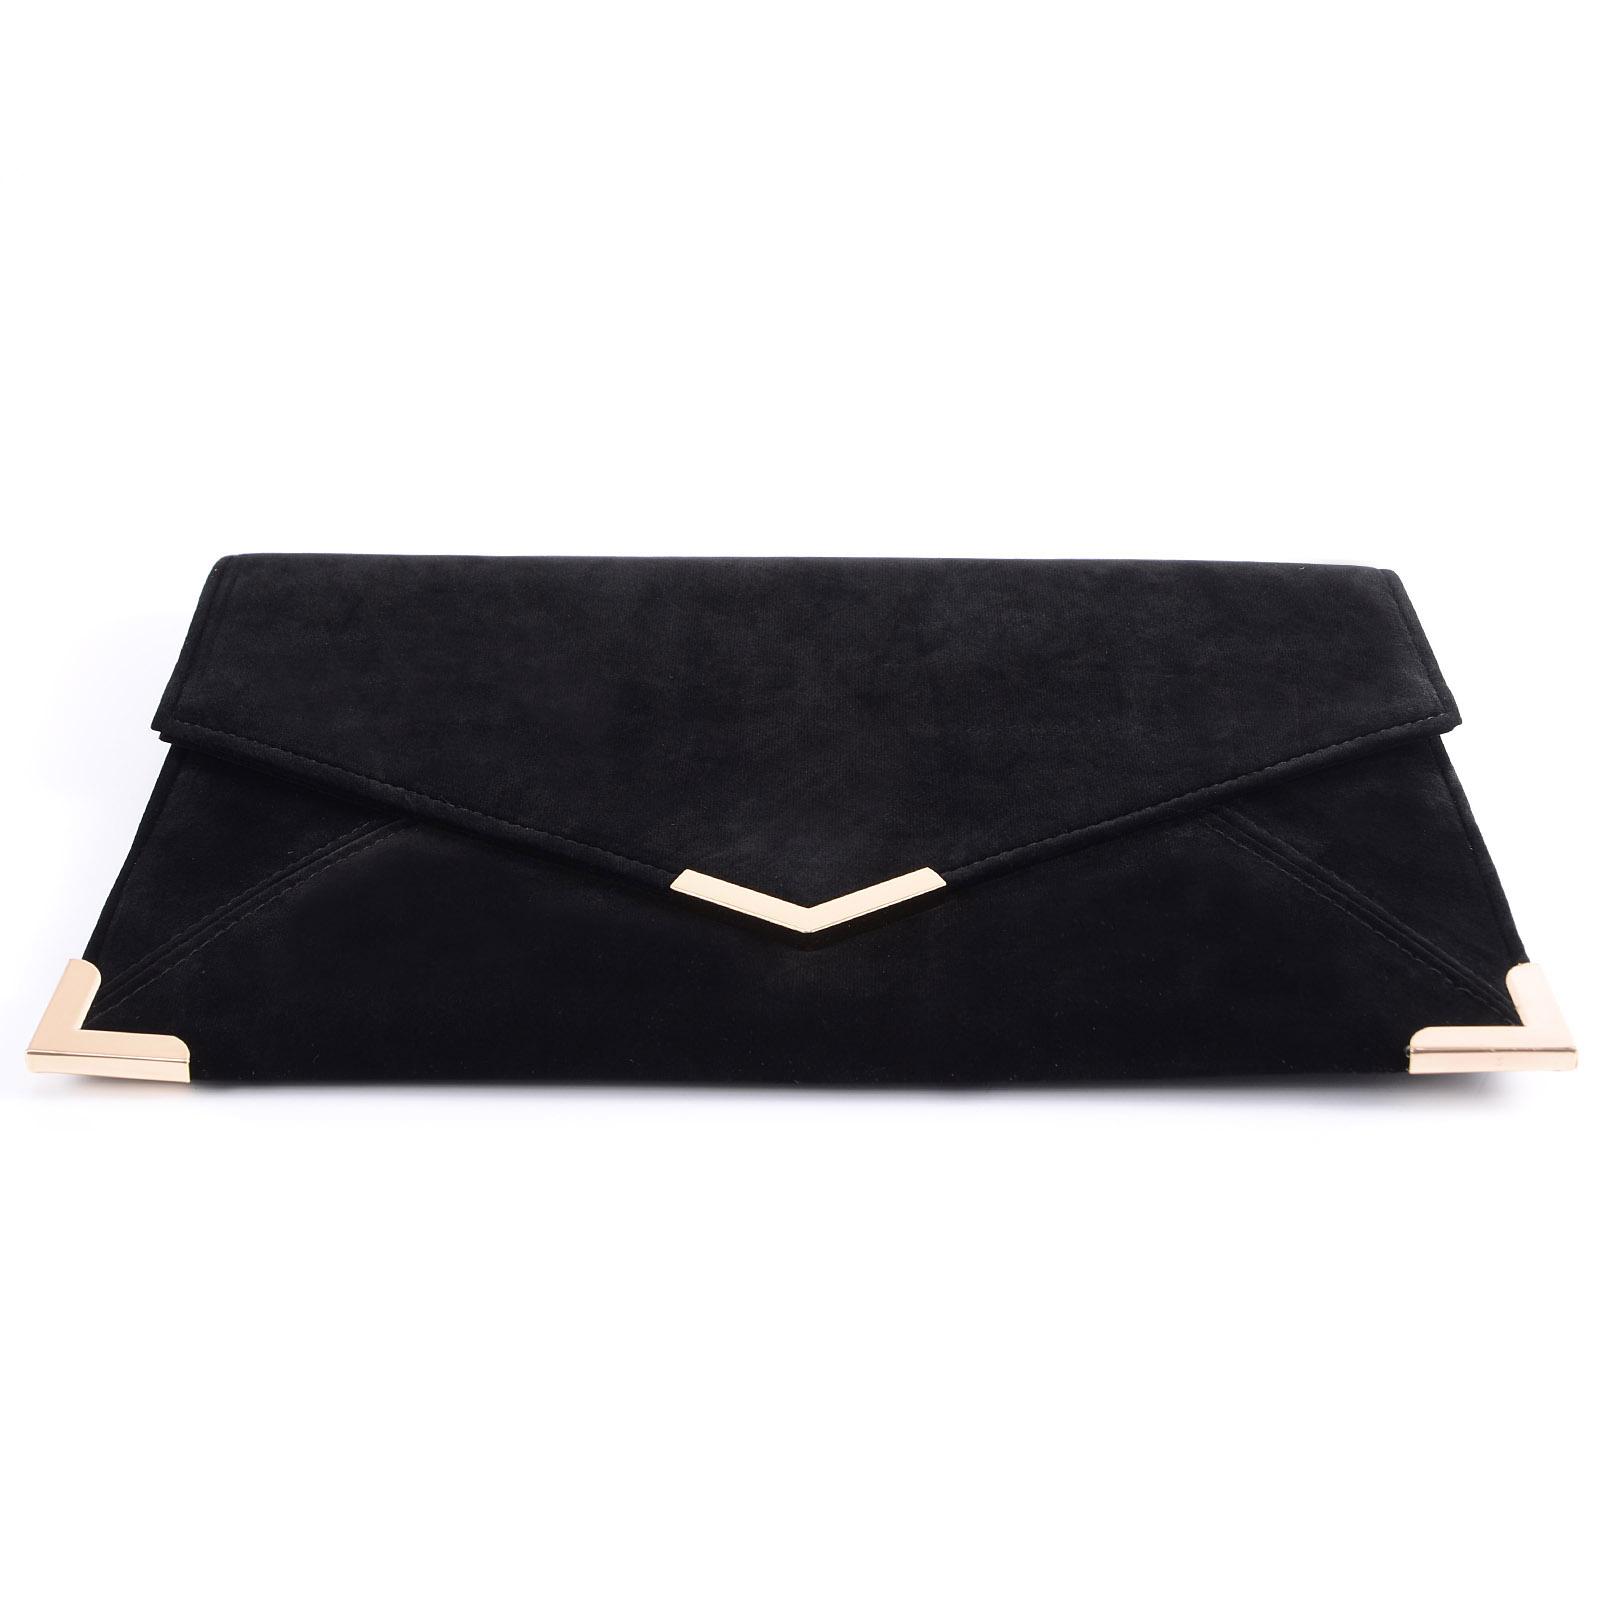 Velours Pochette Mariage Soiree Sac À Main Enveloppe Chaine Bandouliere Velvet Clutch Bag lVAw0C